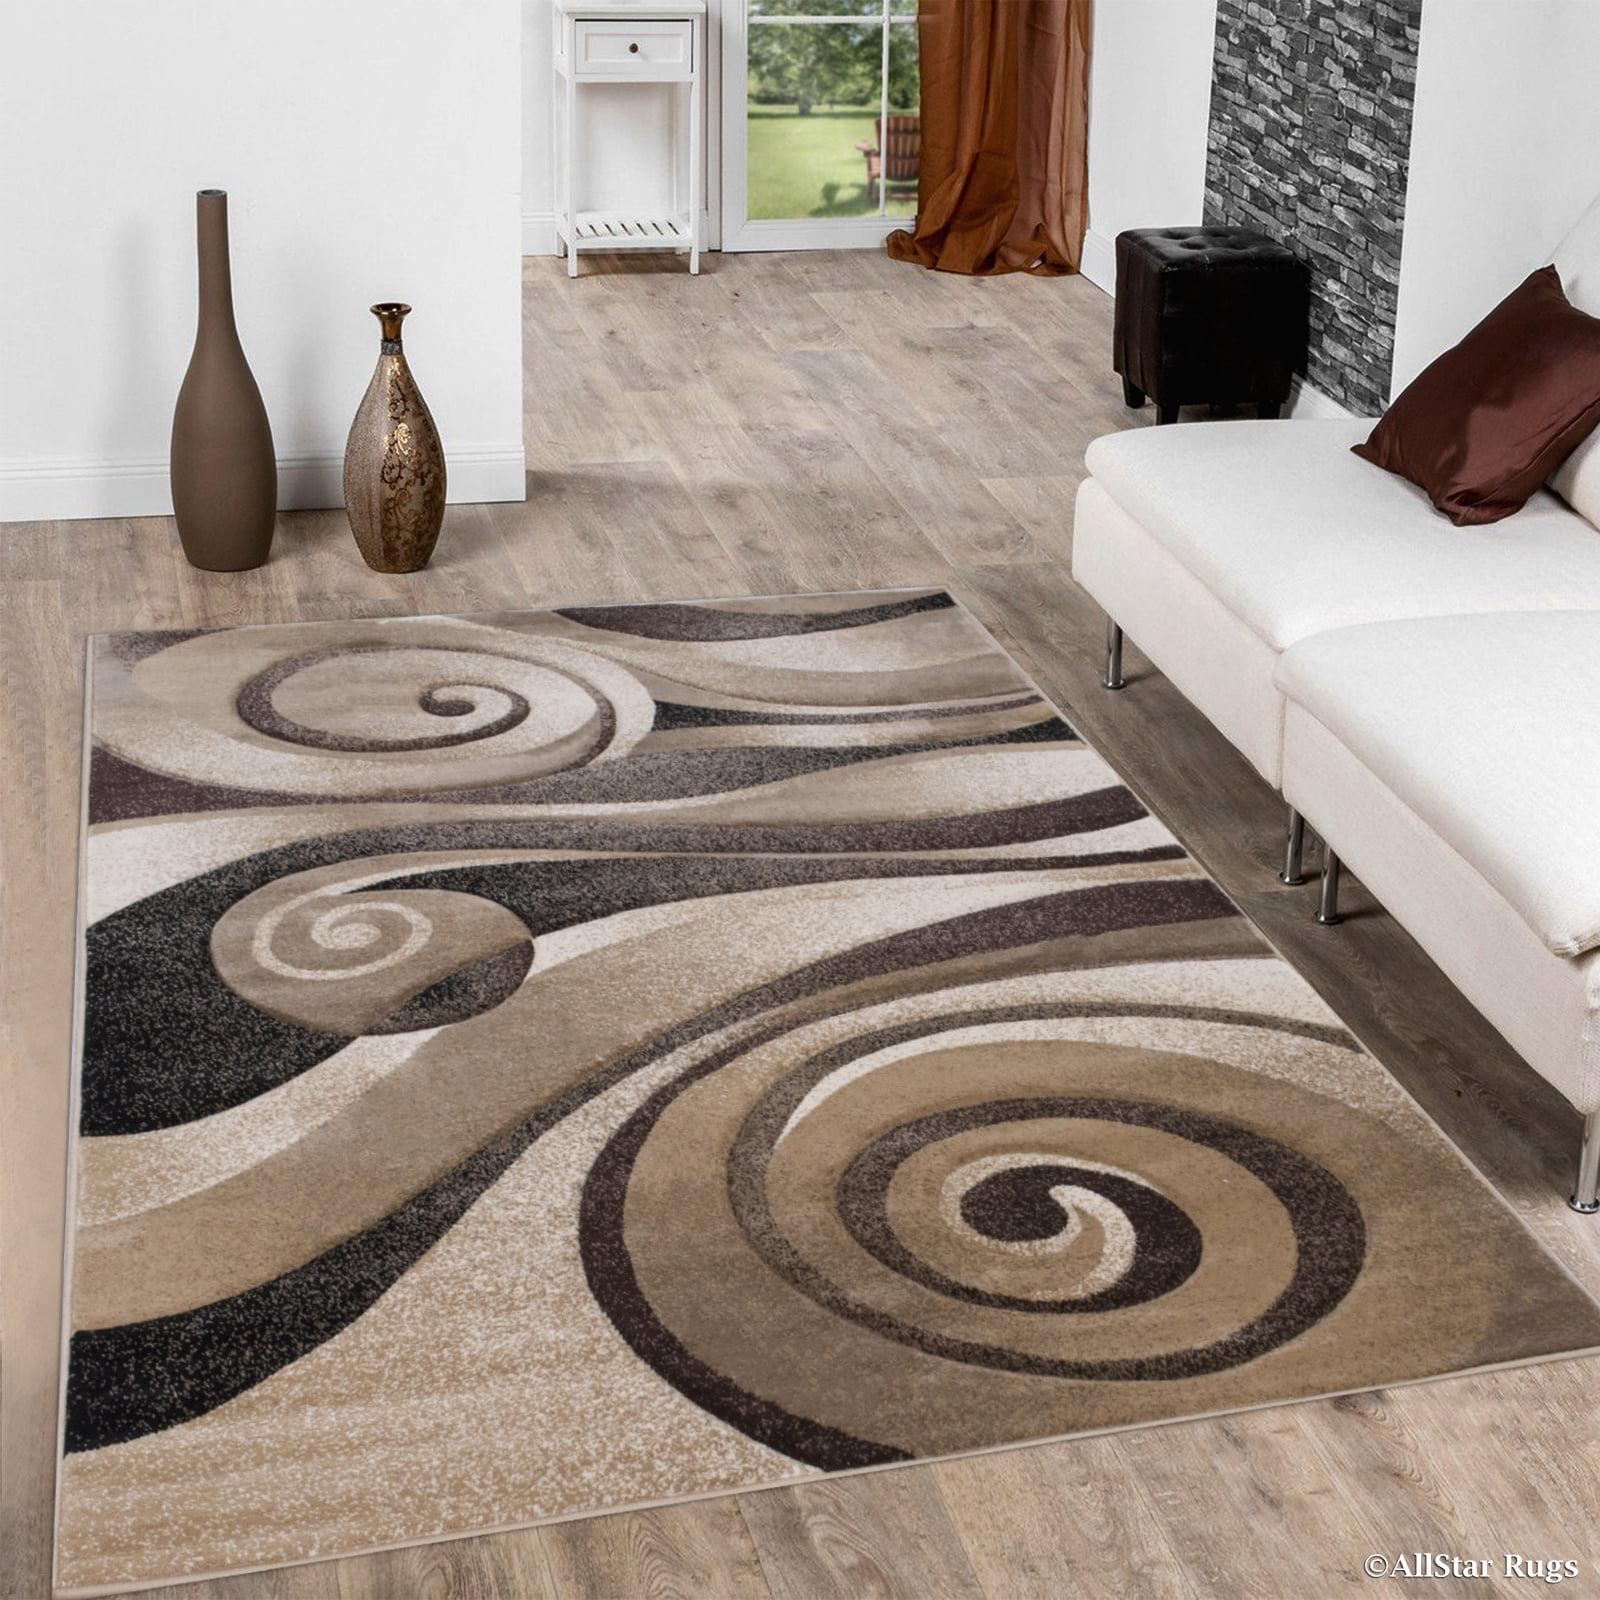 "Allstar Brown   Beige Woven Hand Carved Floral Spiral Design Area Rug (5' 2"" x 7'... by Overstock"